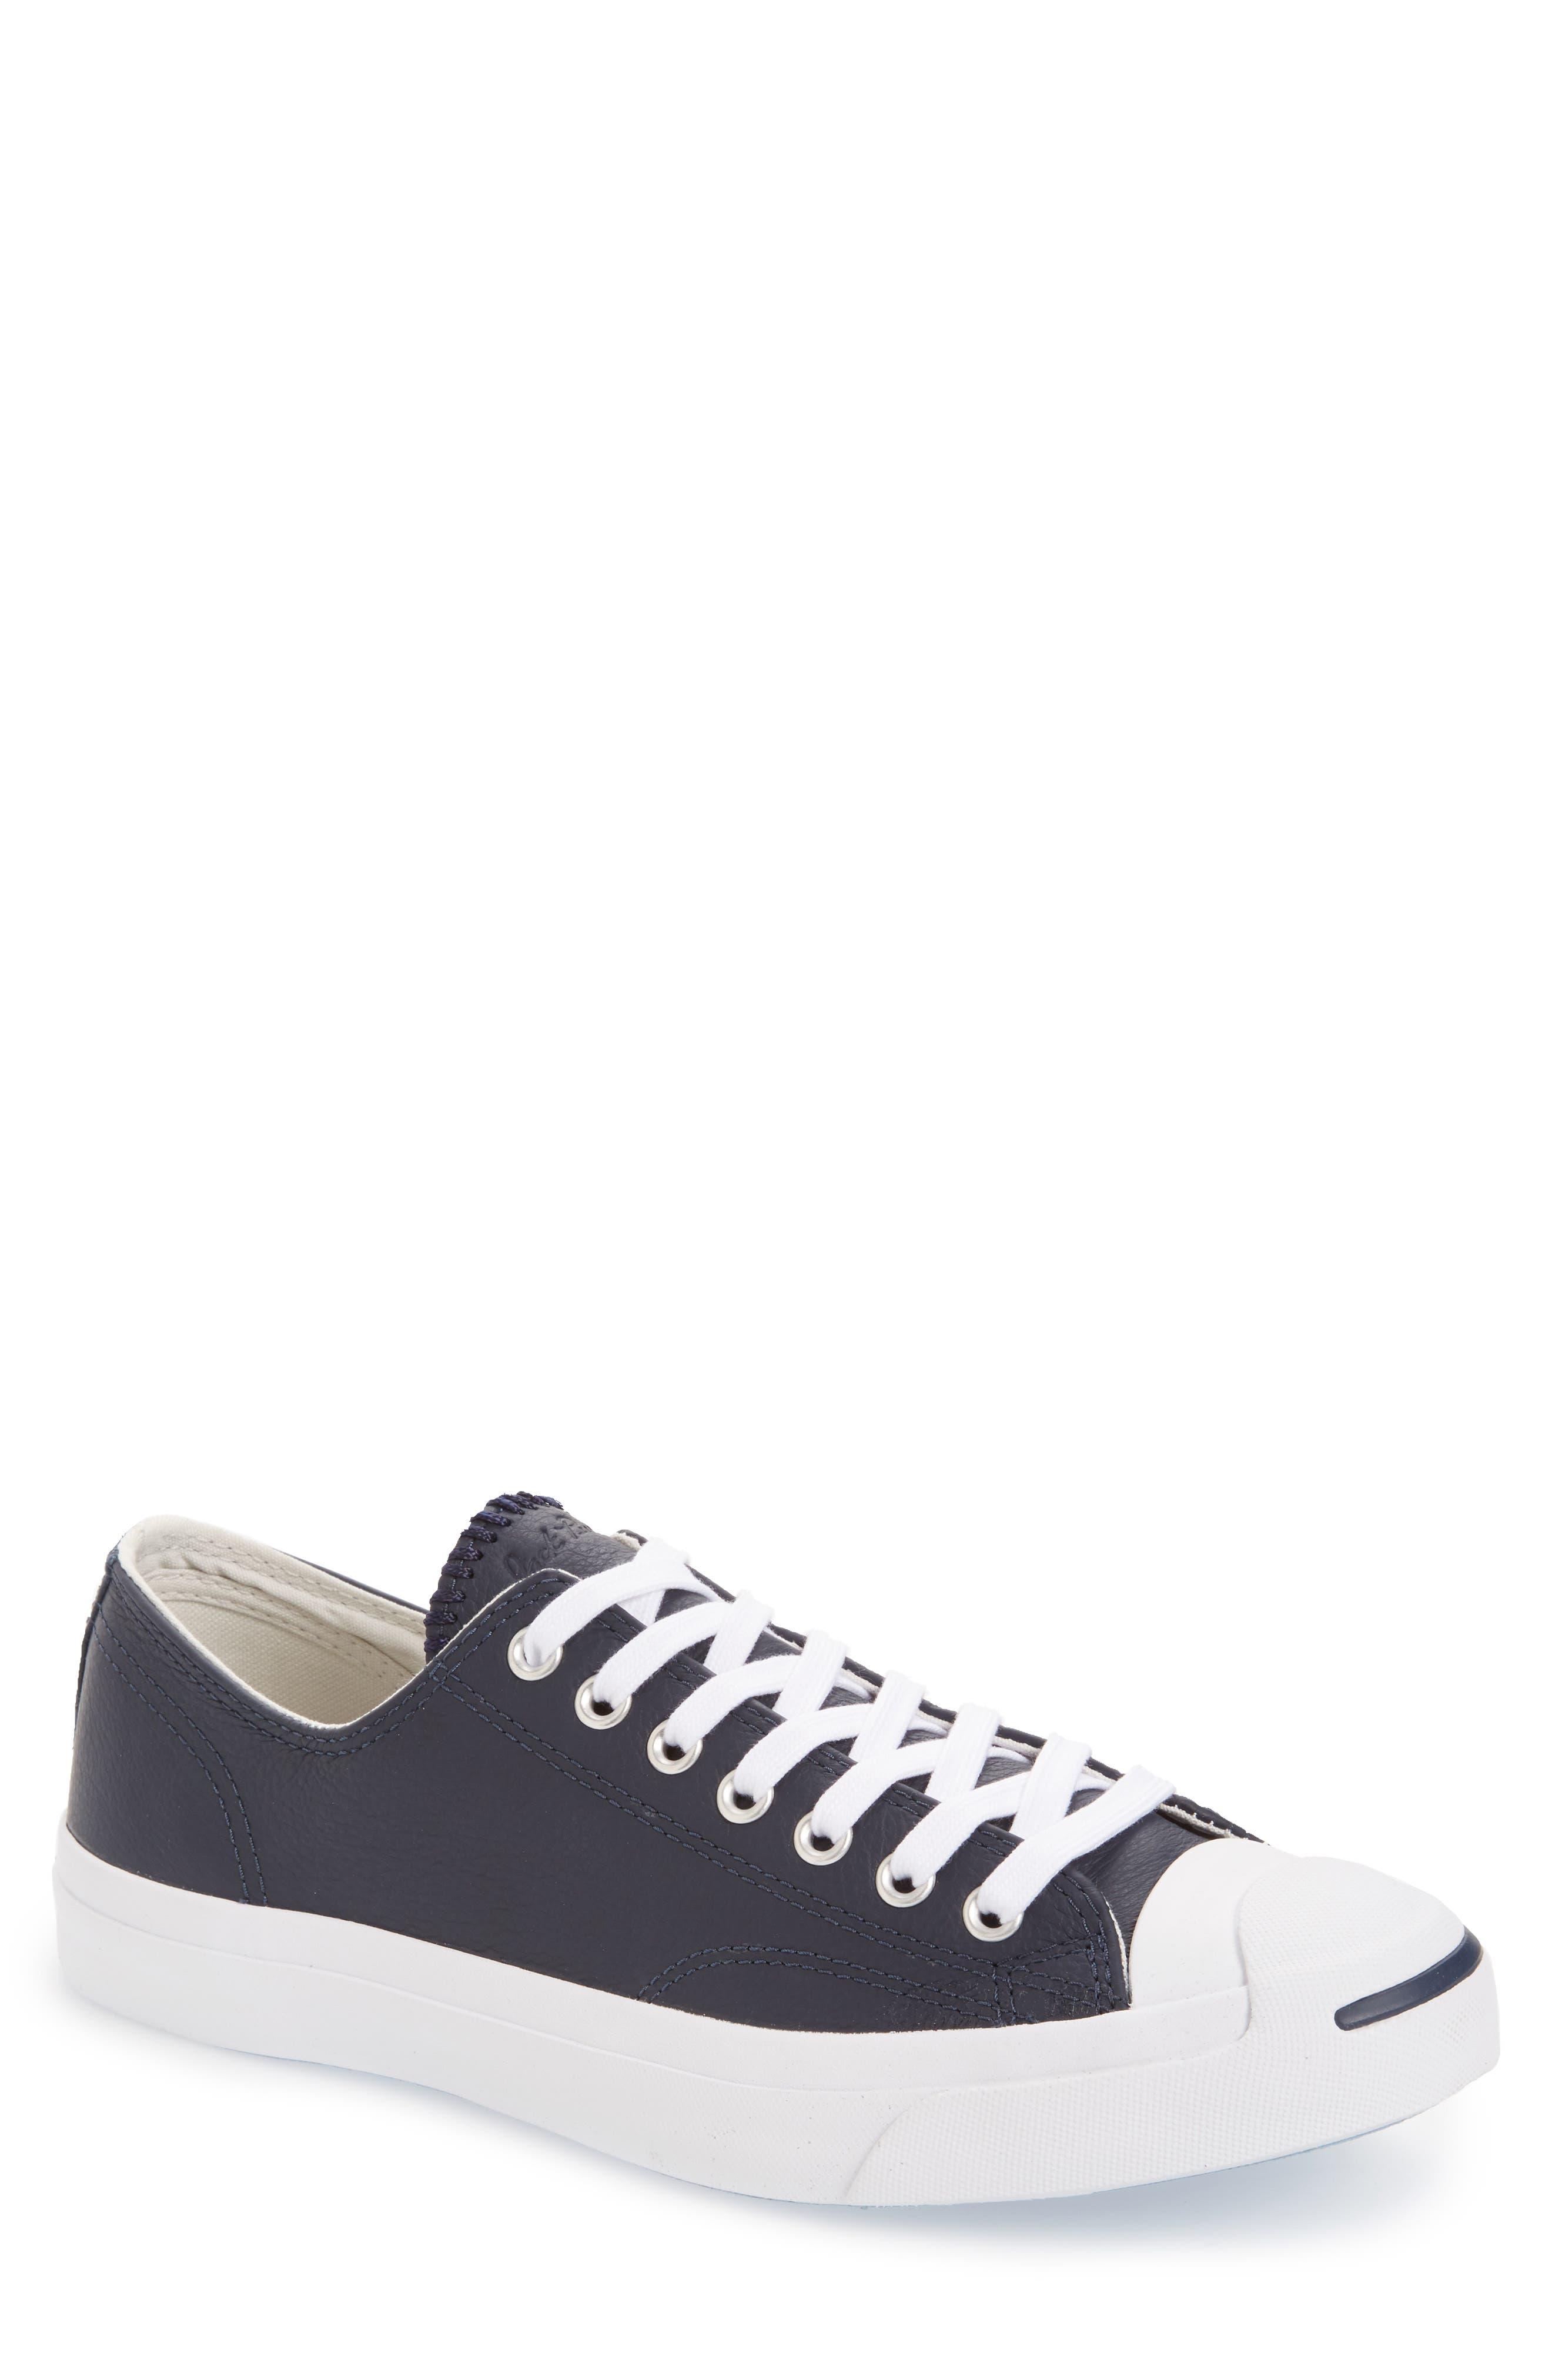 Alternate Image 1 Selected - Converse 'JP Jack' Sneaker (Men)